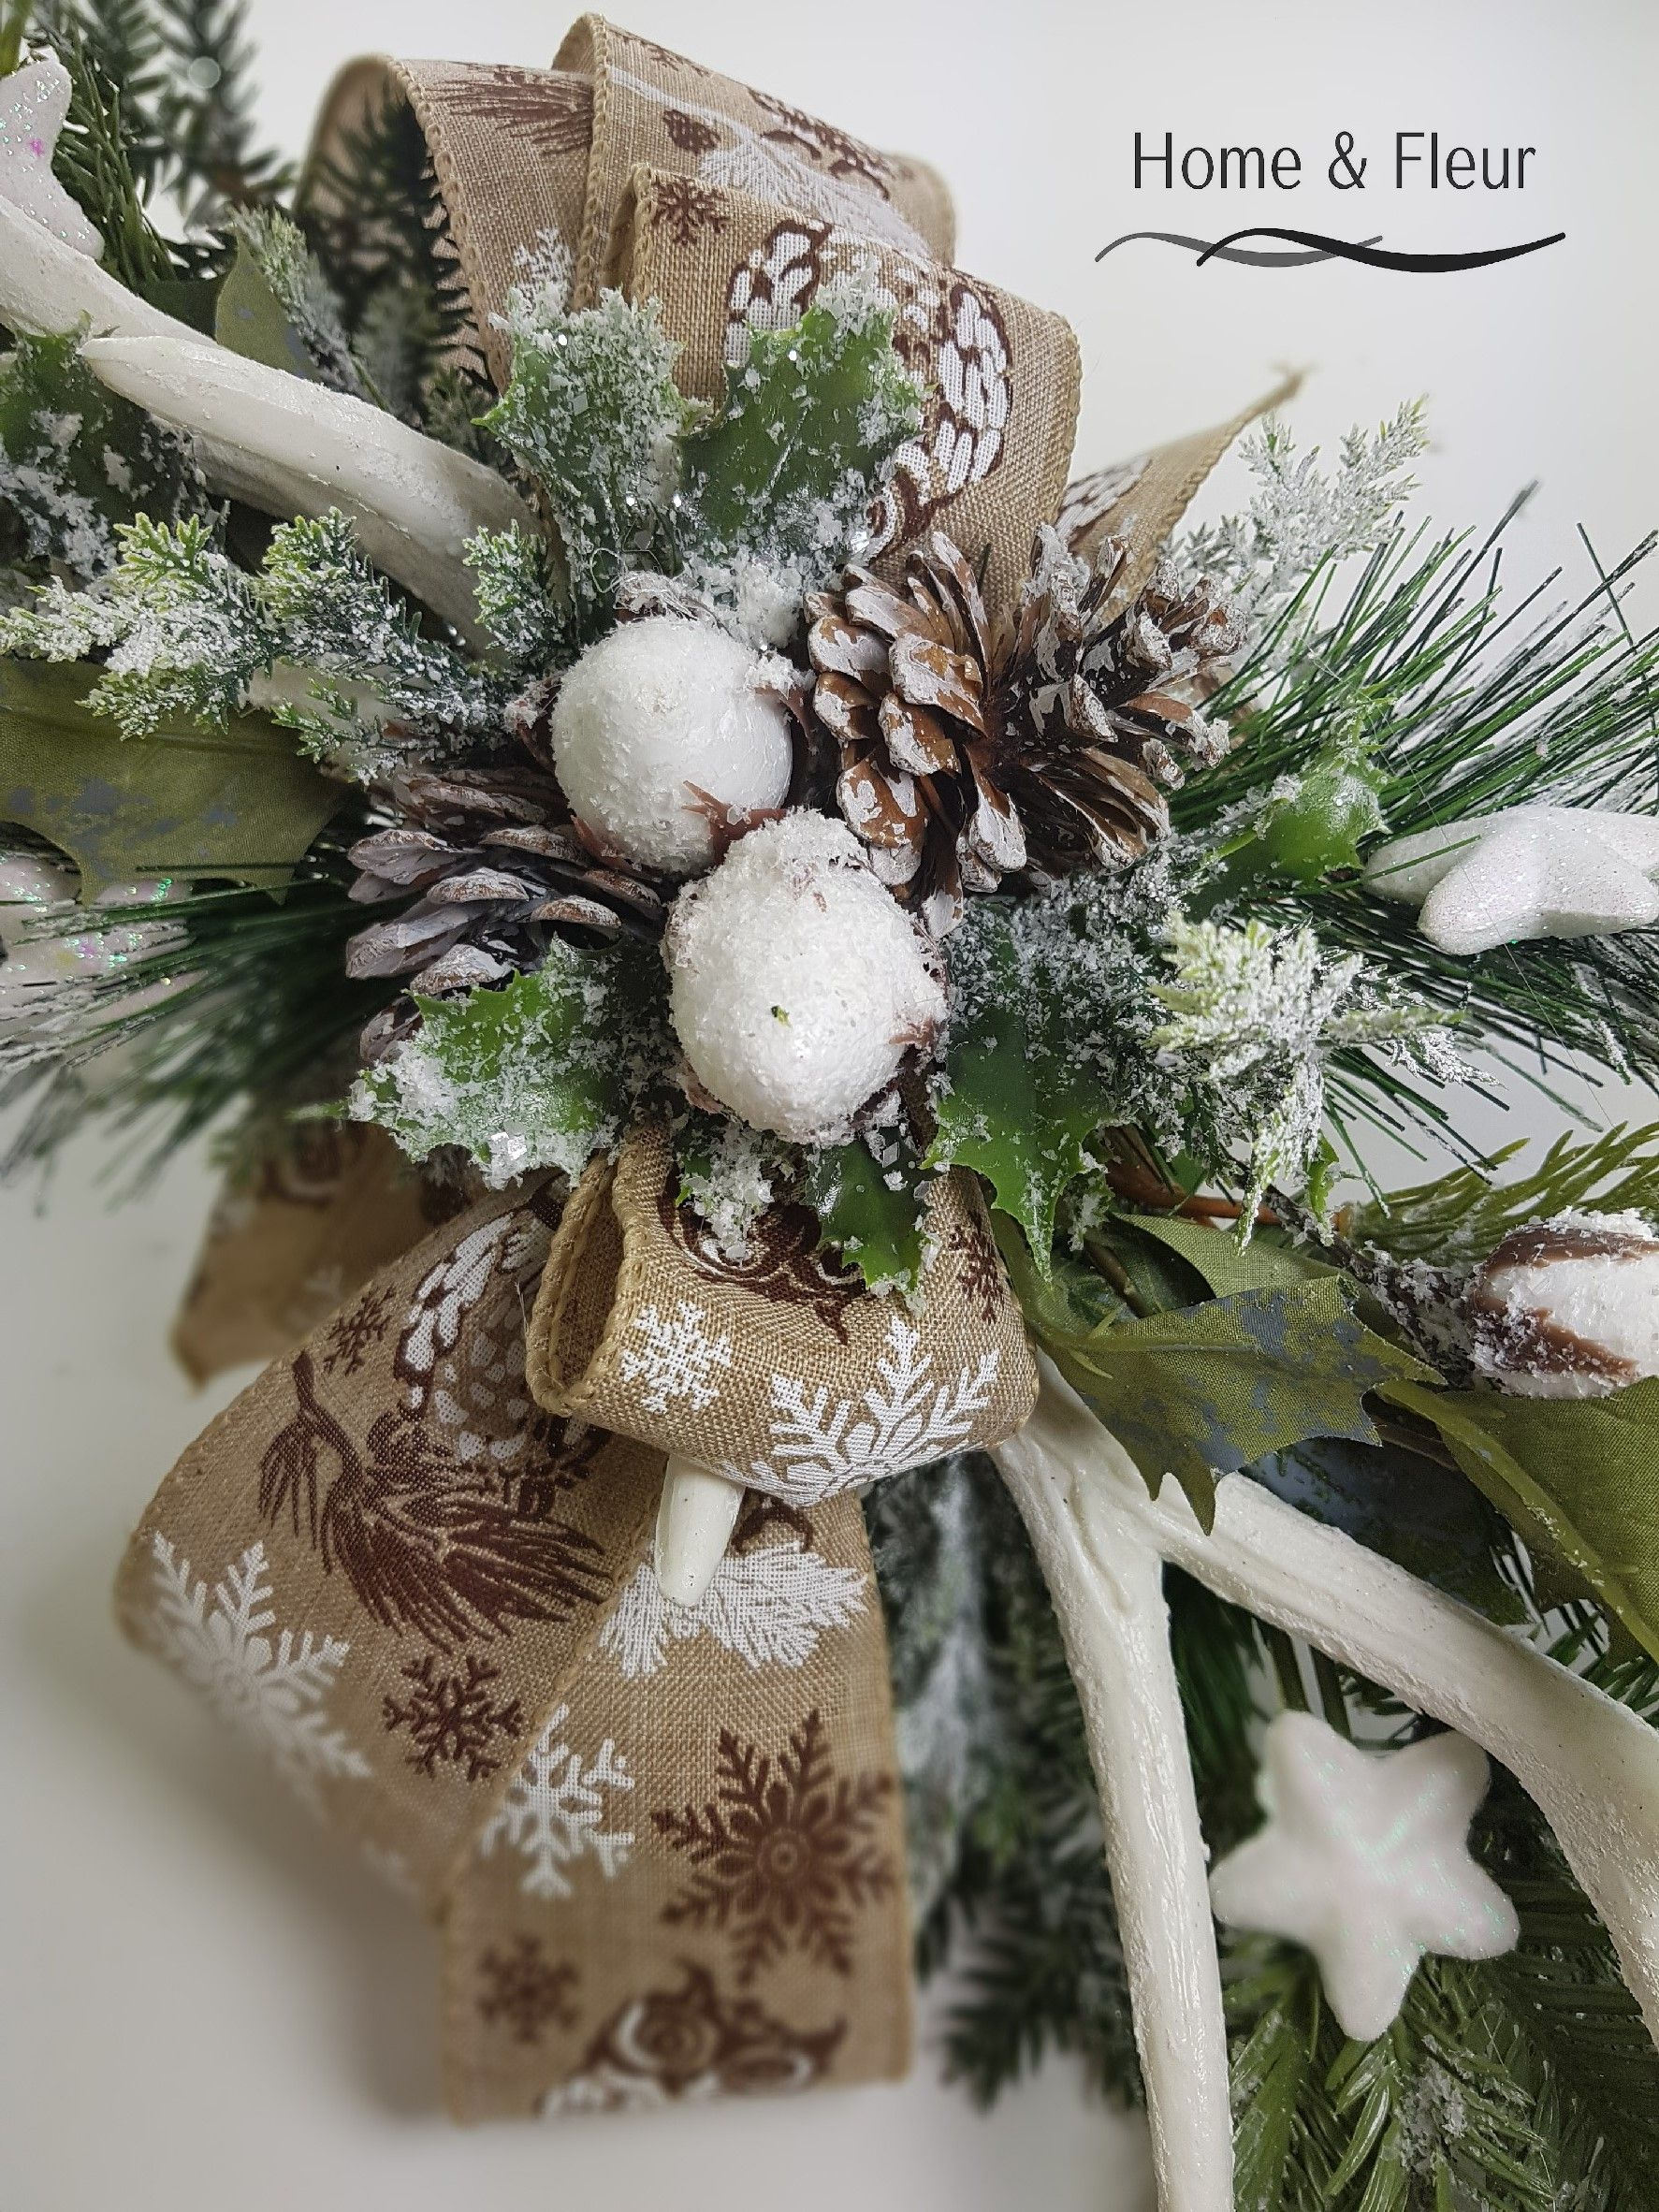 Boze Narodzenie Stroik Girlanda Na Komode Christmas Wreaths Holiday Decor Home Decor